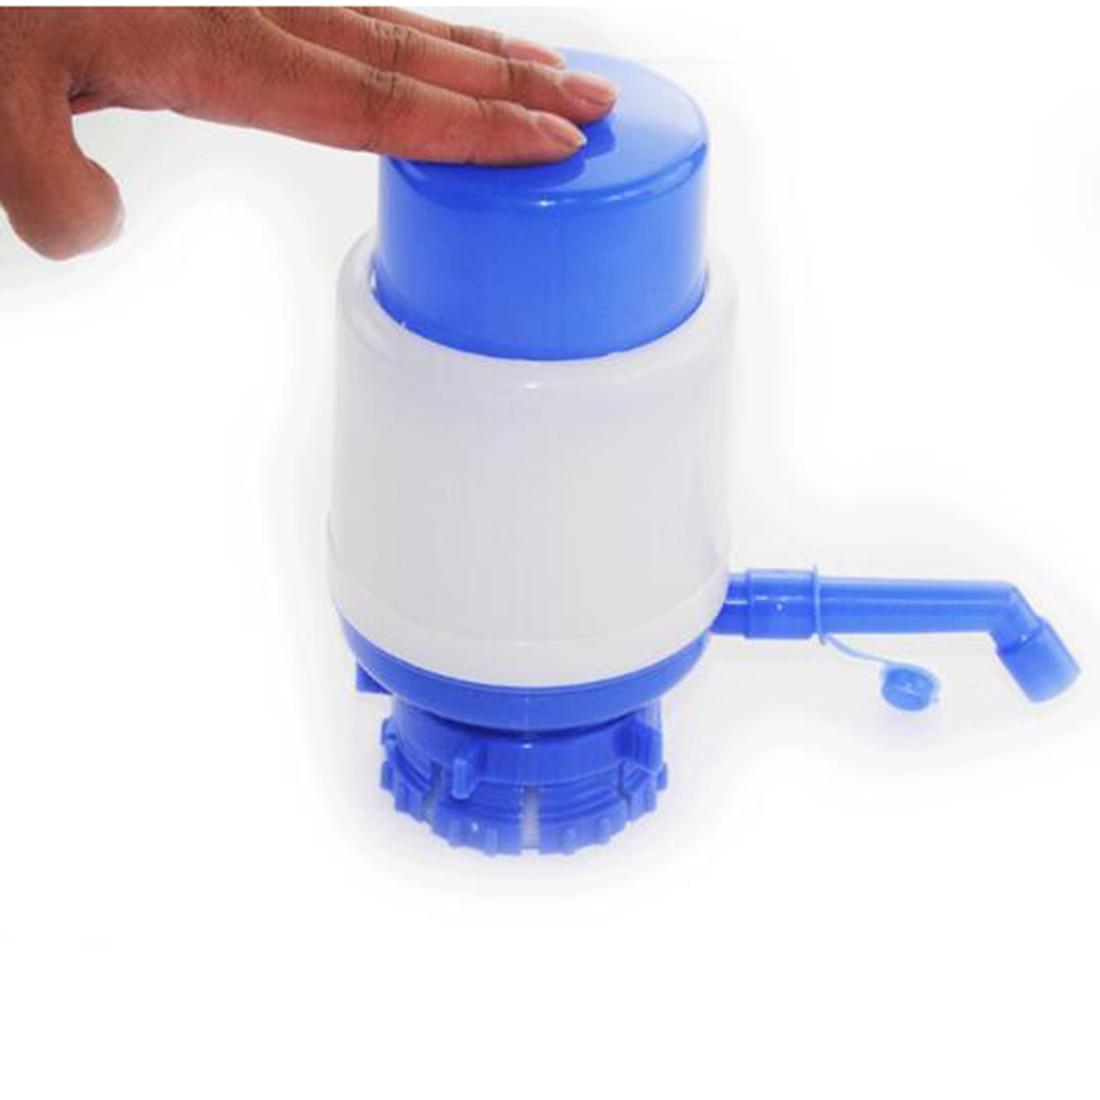 Best Seller Random Color Household Manual Water Bottle/Jug Hand Pump Hand Press Dispenser 1